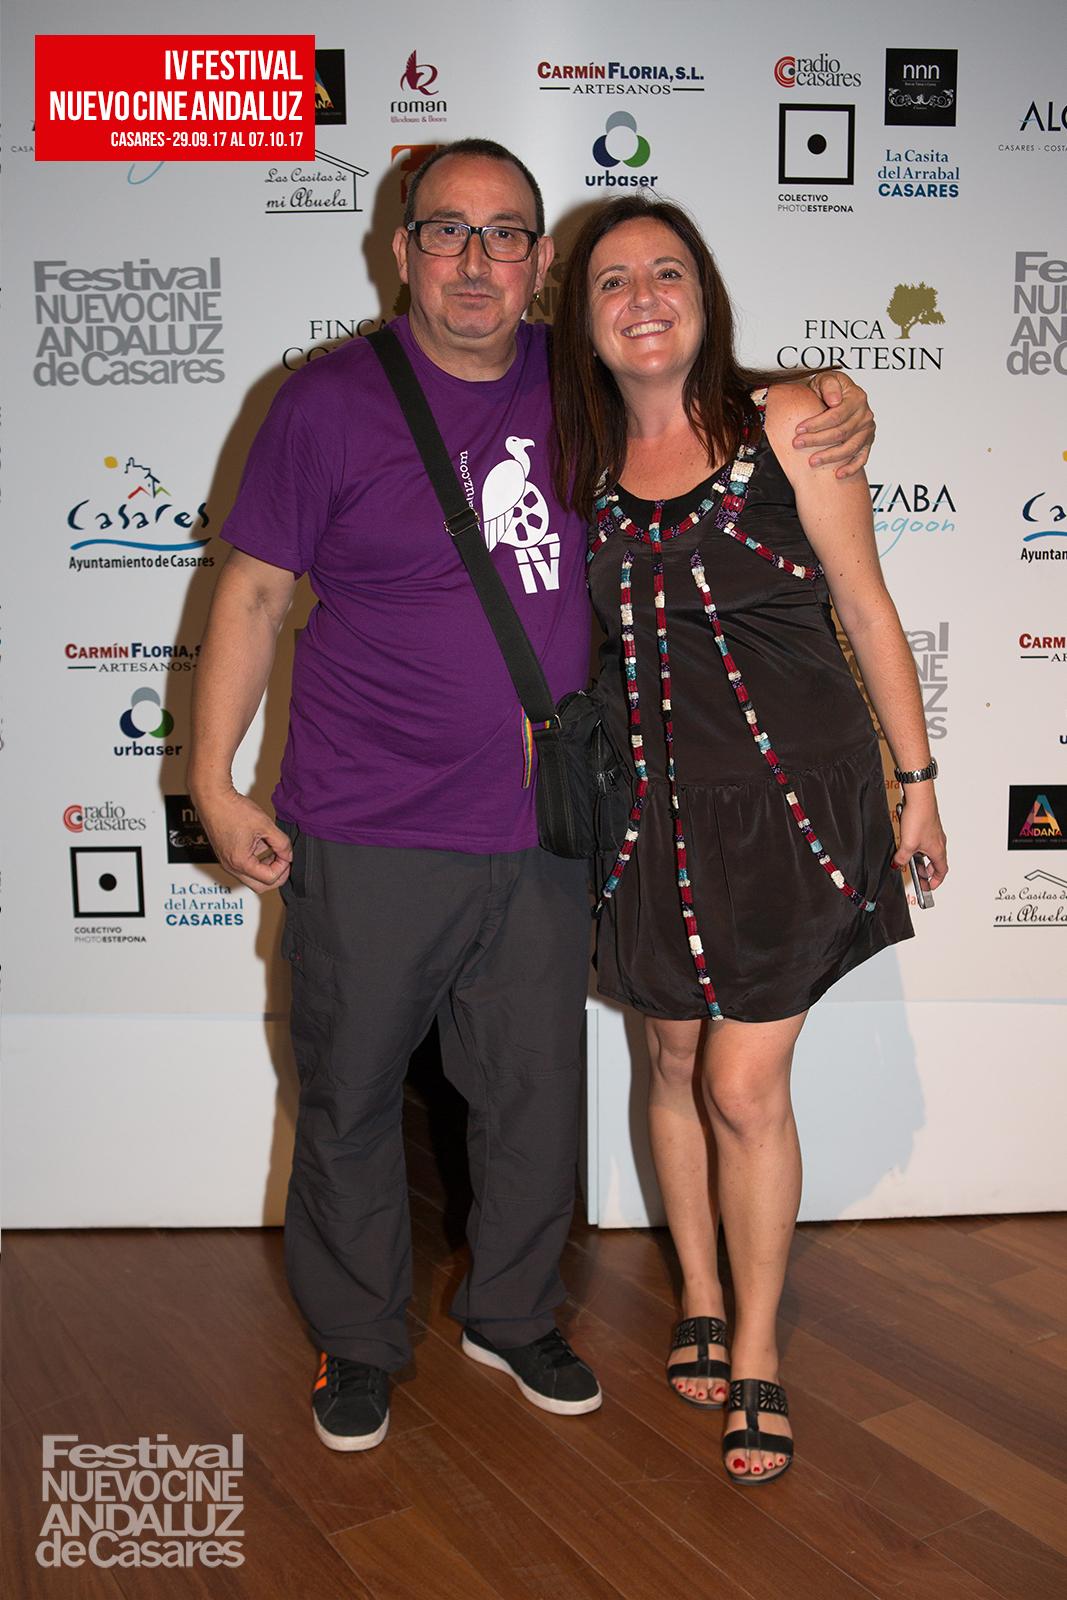 IV Festival Nuevo Cine Andaluz